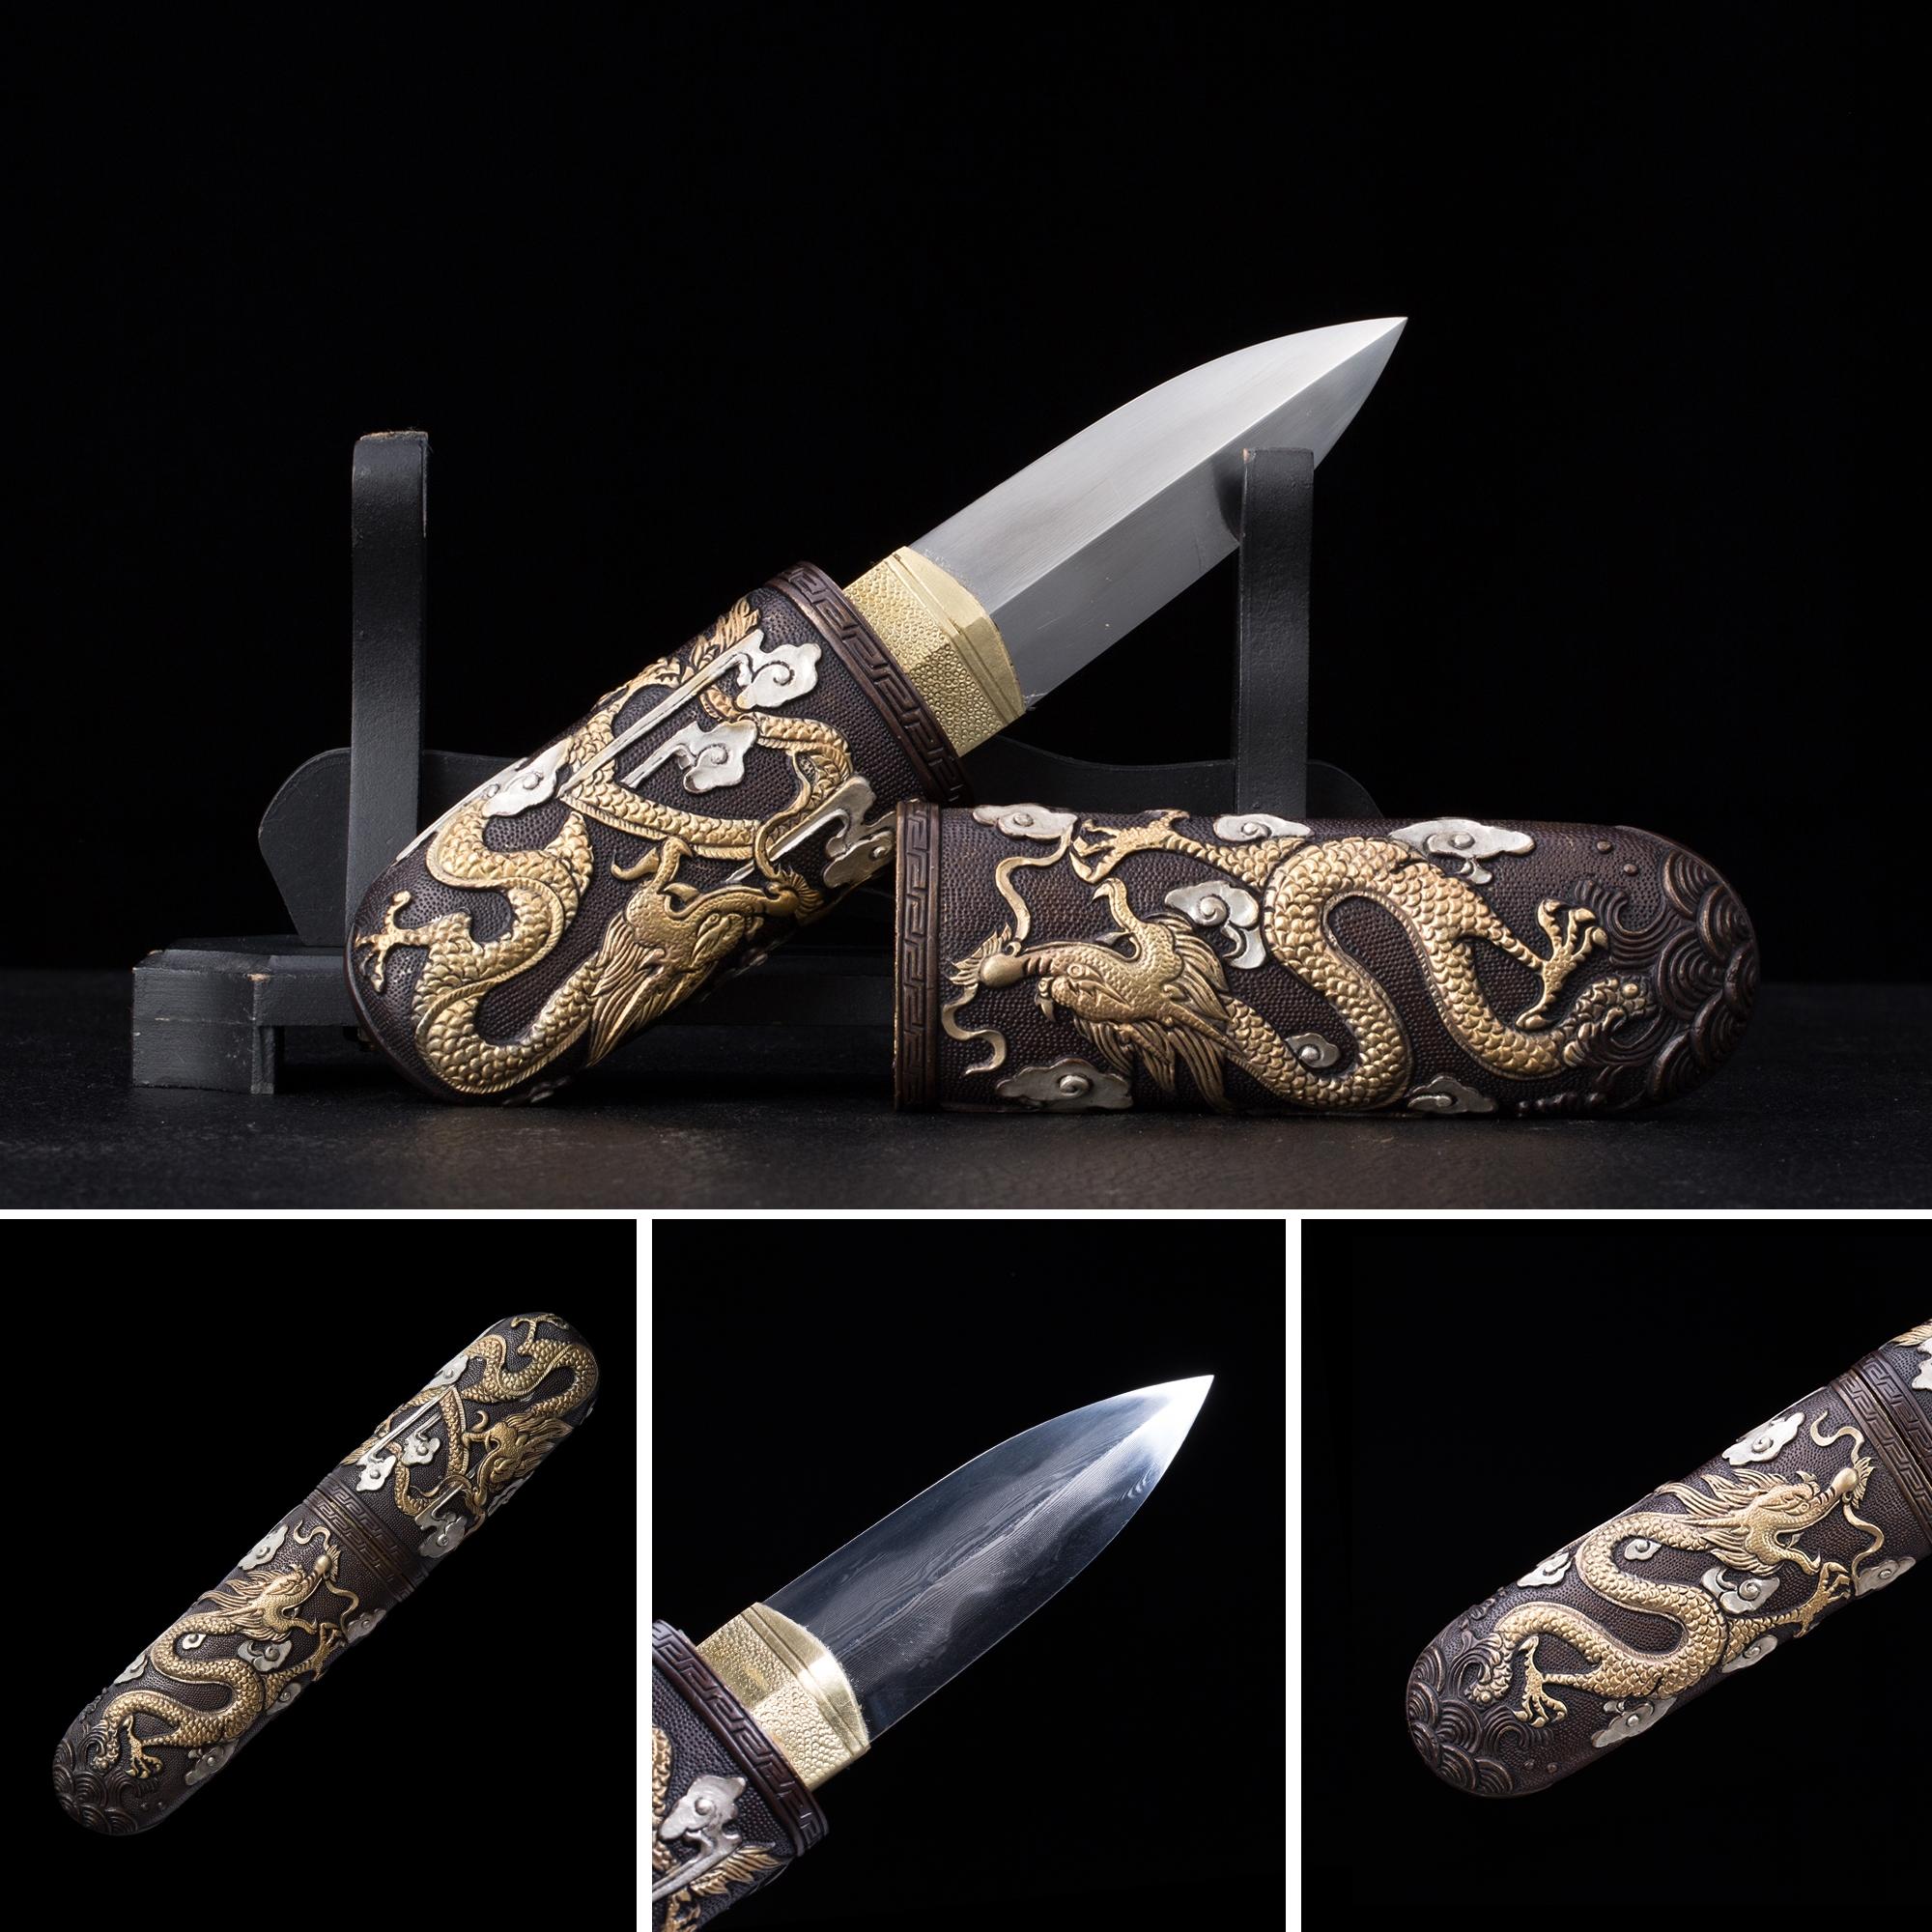 High-performance T10 Carbon Steel Double Edge Blade Short Katana Japanese Aikuchi Pocket Tanto Knife